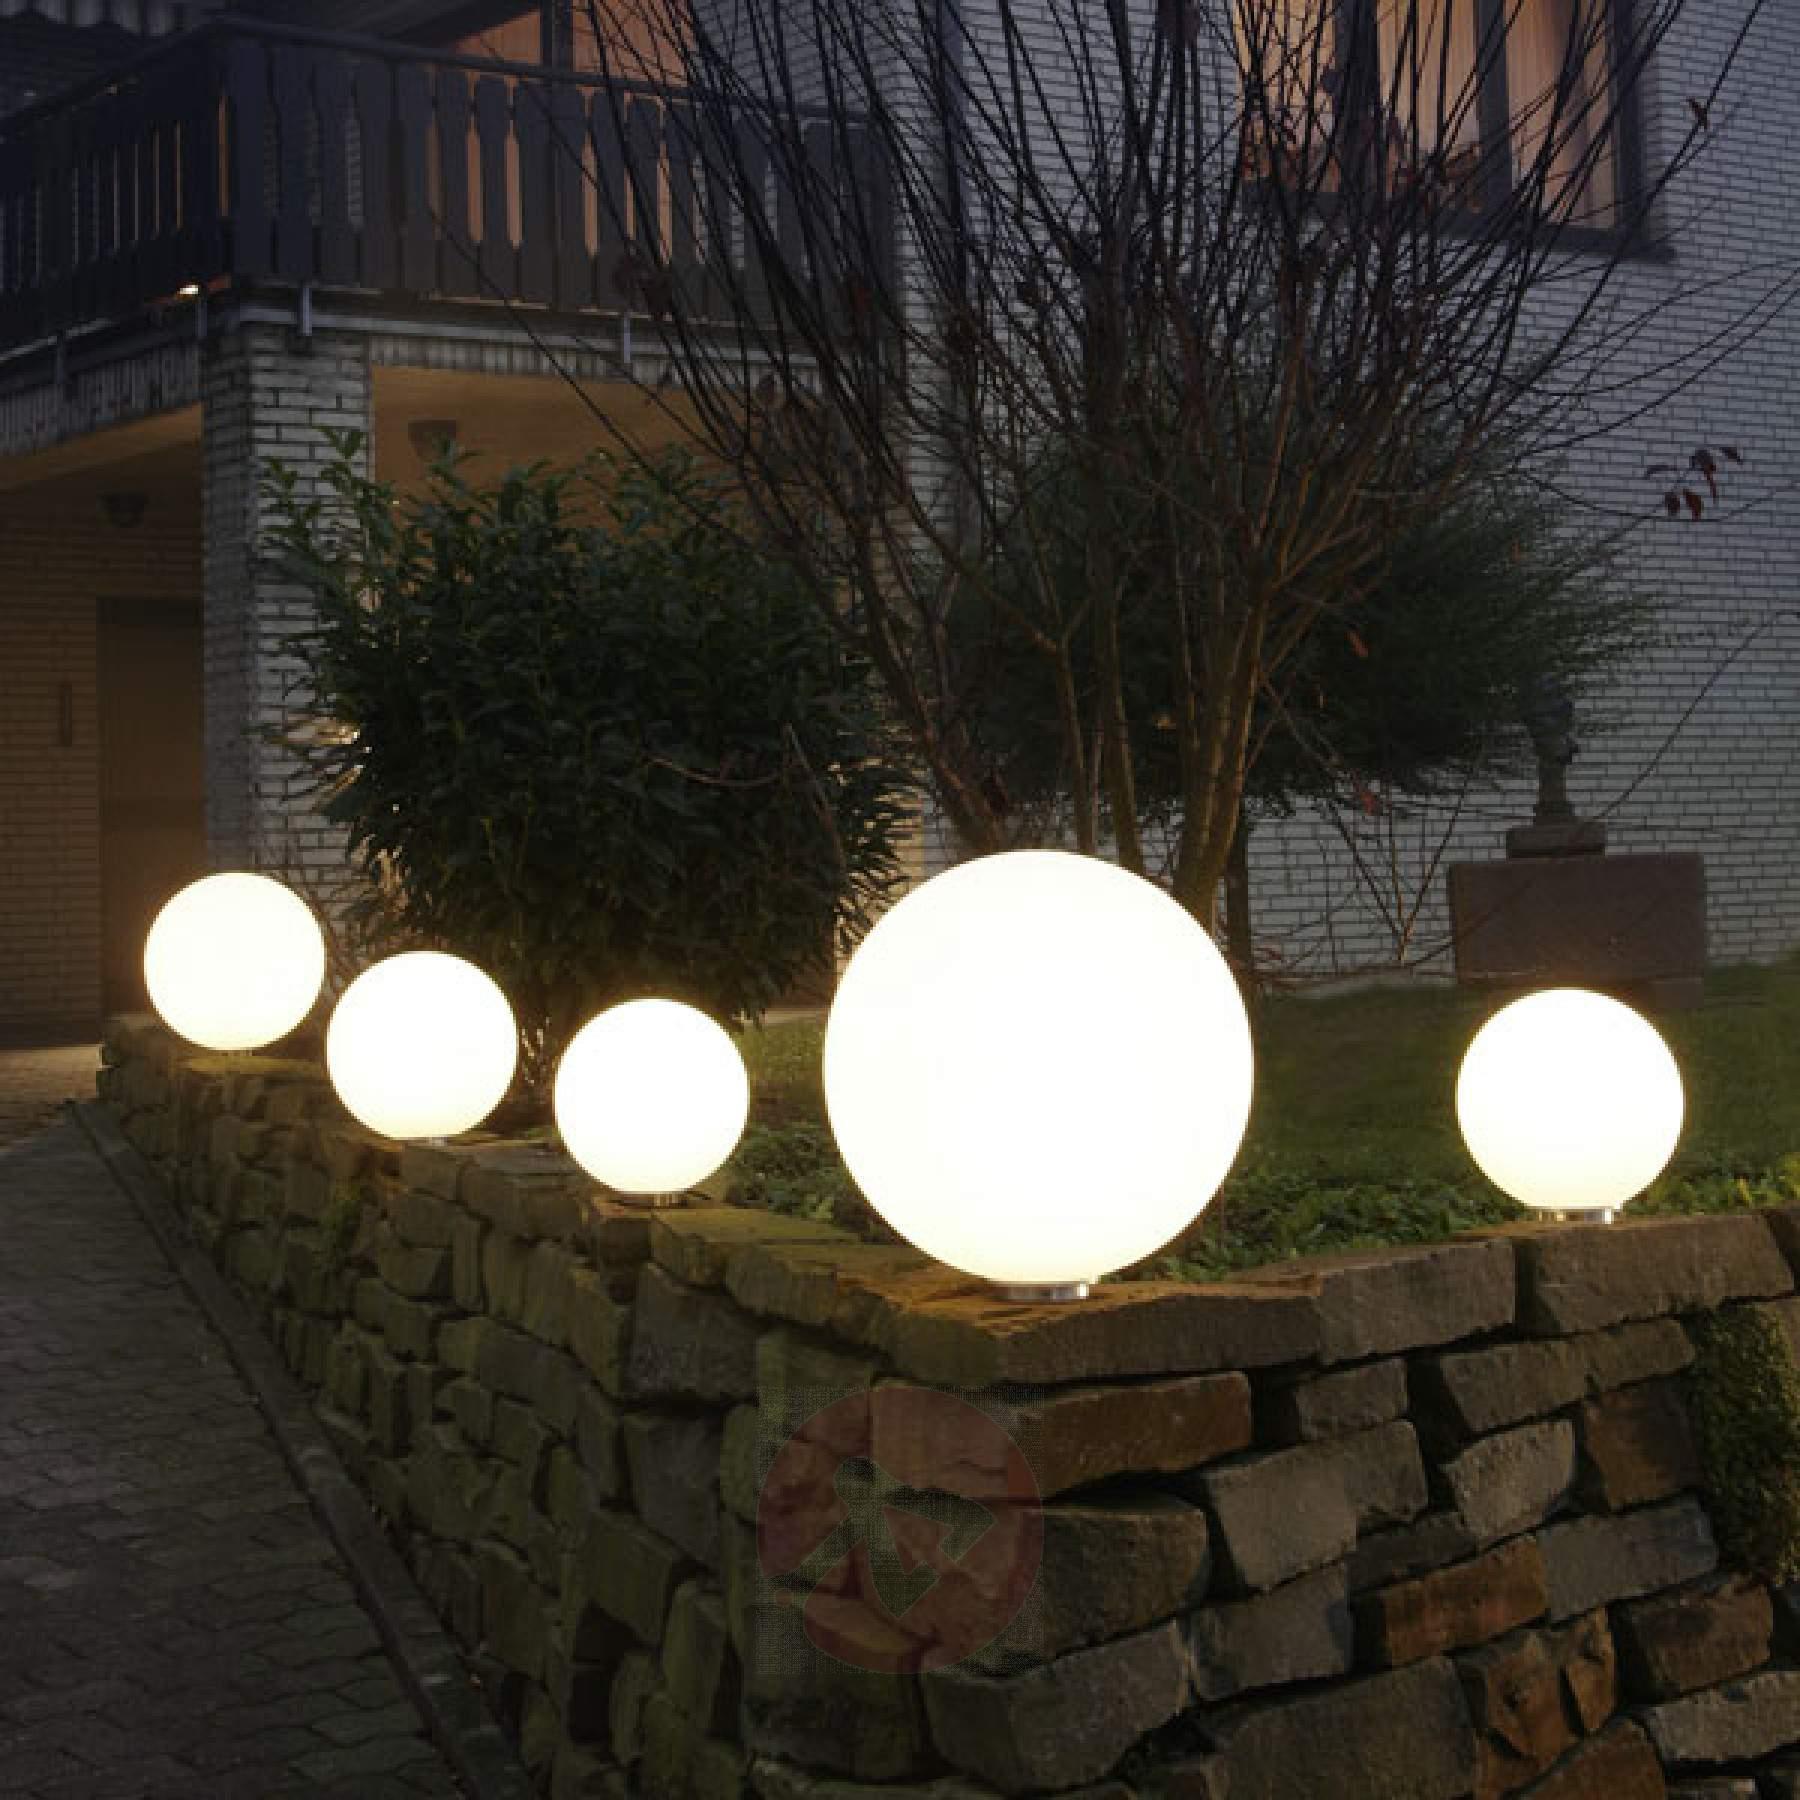 Full Size of Kugelleuchten Garten Kugellampen Amazon Obi Led Kugelleuchte Solar Test Standortfeste Snowball Wei Malu Fu Kaufen überdachung Edelstahl Brunnen Im Gaskamin Garten Kugelleuchten Garten